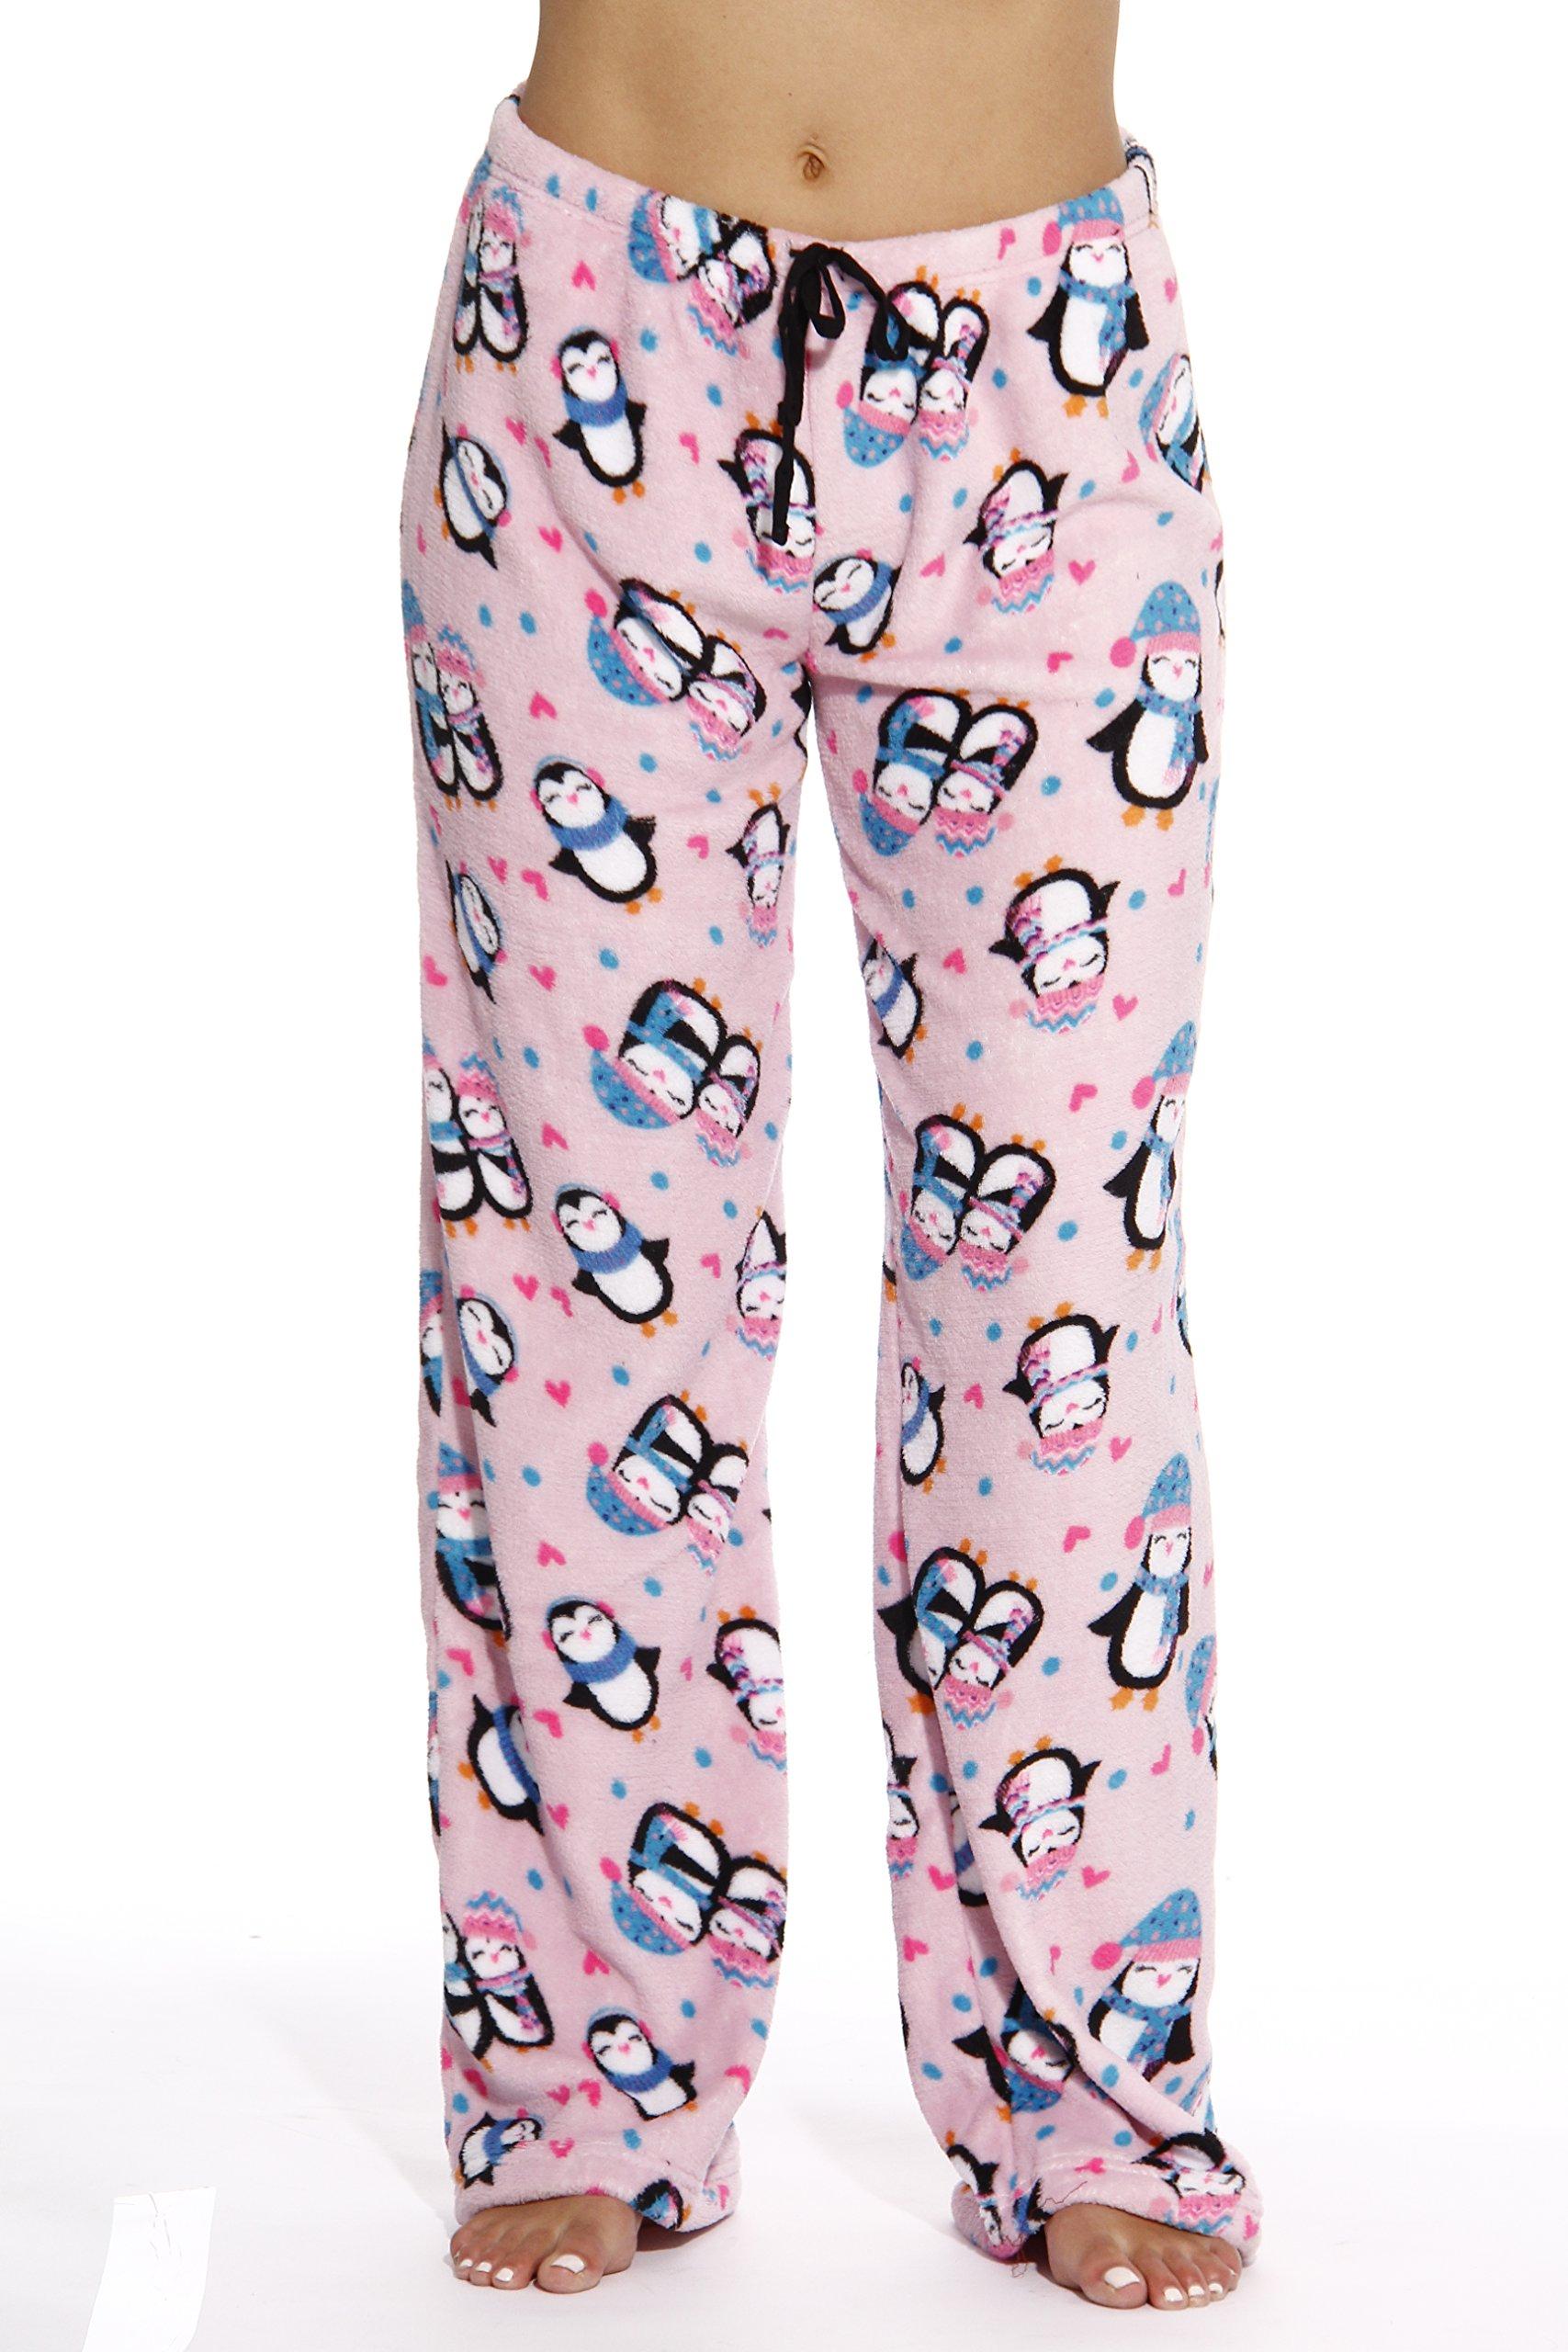 6339-10126-L Just Love Women's Plush Pajama Pants - Petite to Plus Size Pajamas,Pink - Penguin Love,Large